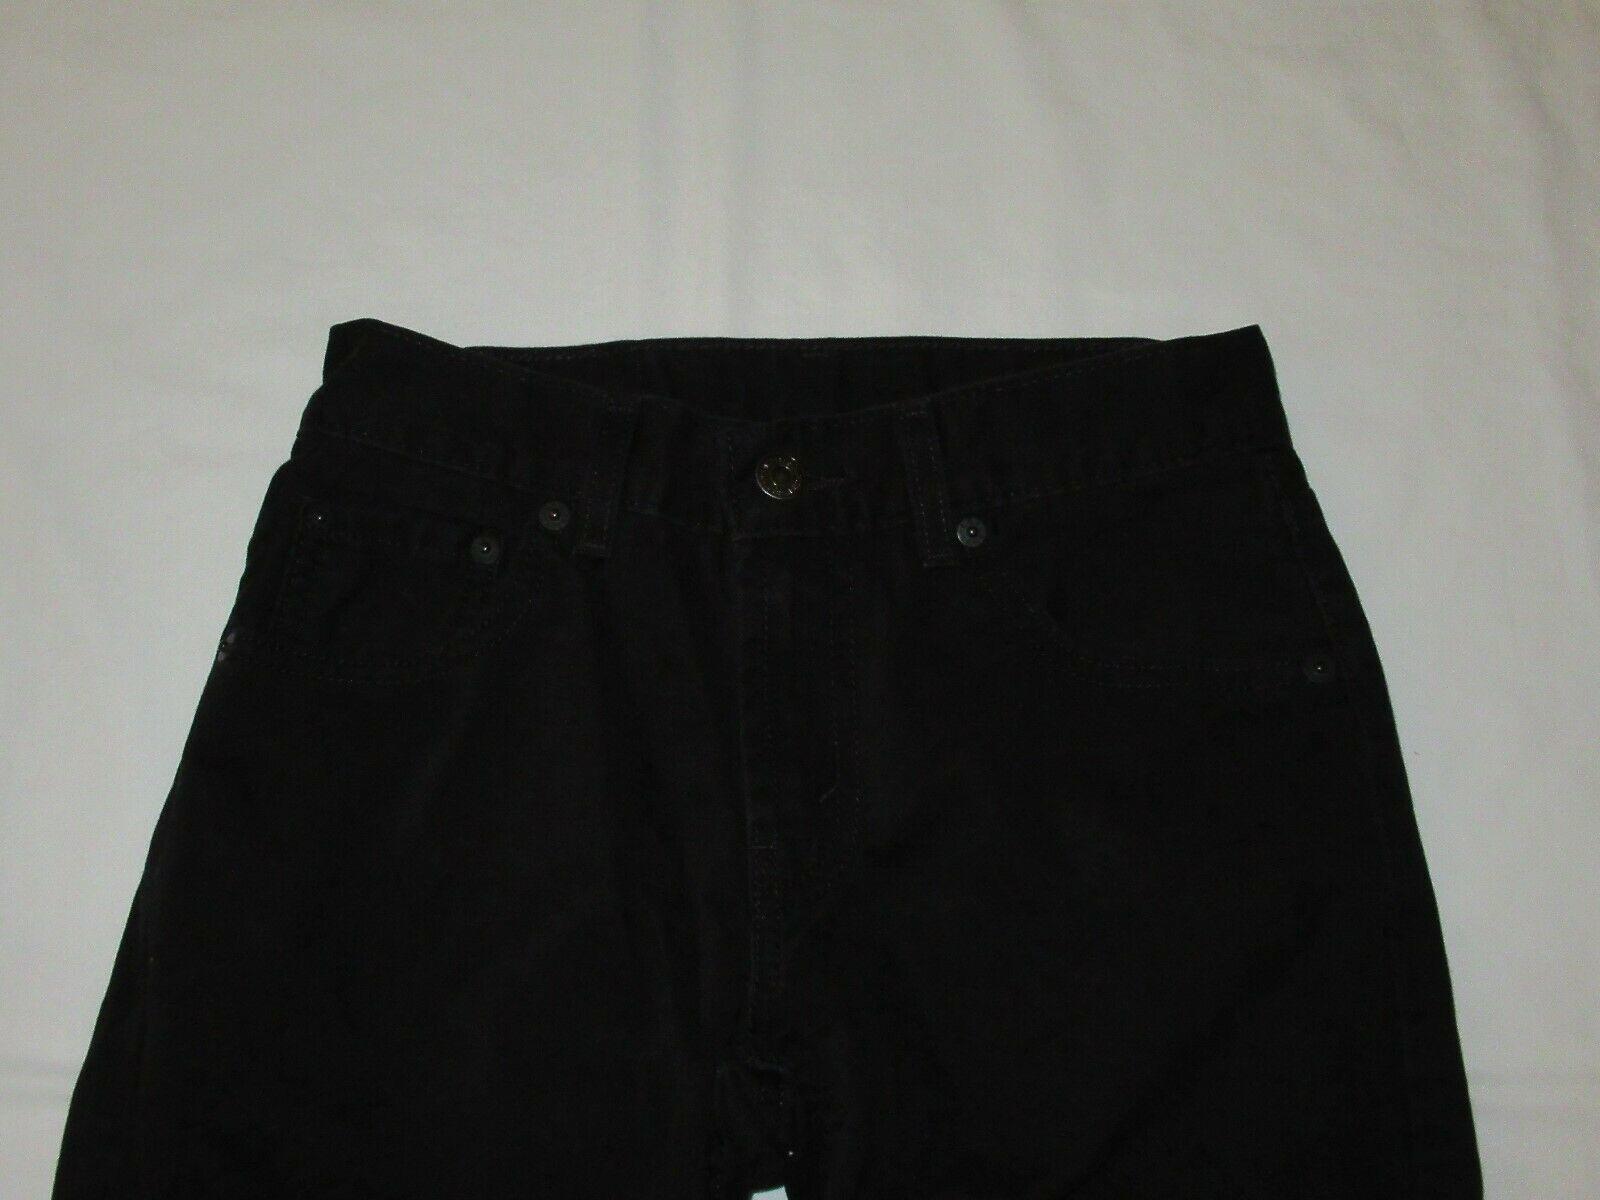 Boys Levis 505 Straight Black Denim Jeans Size 10 Reg Short! Brushed Cotton Warm image 3